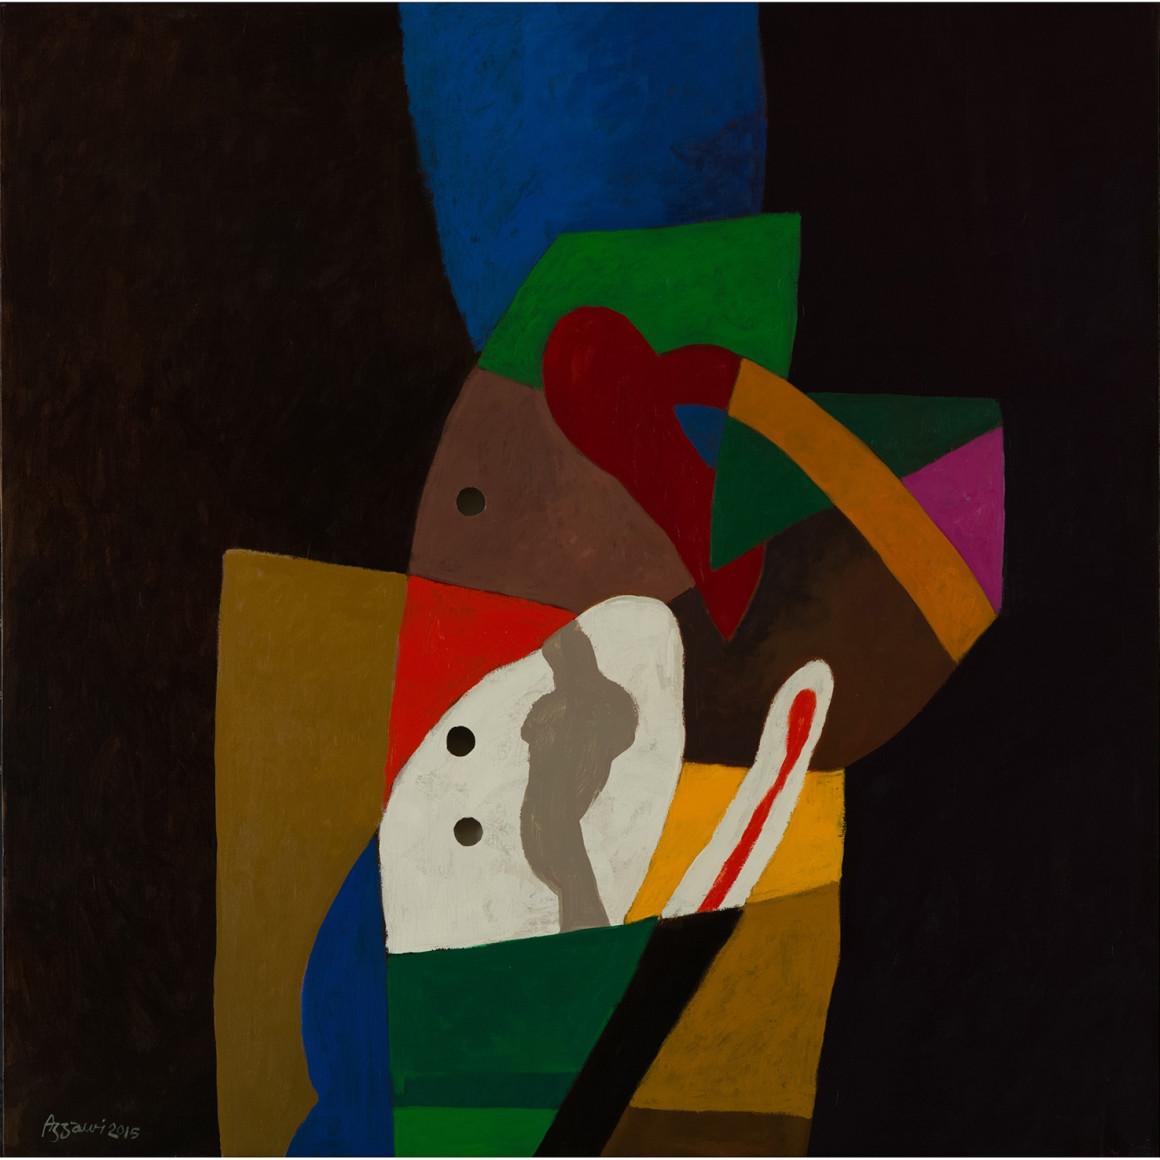 Dia al-Azzawi, Three Hollows in a Coloured Window, 2015